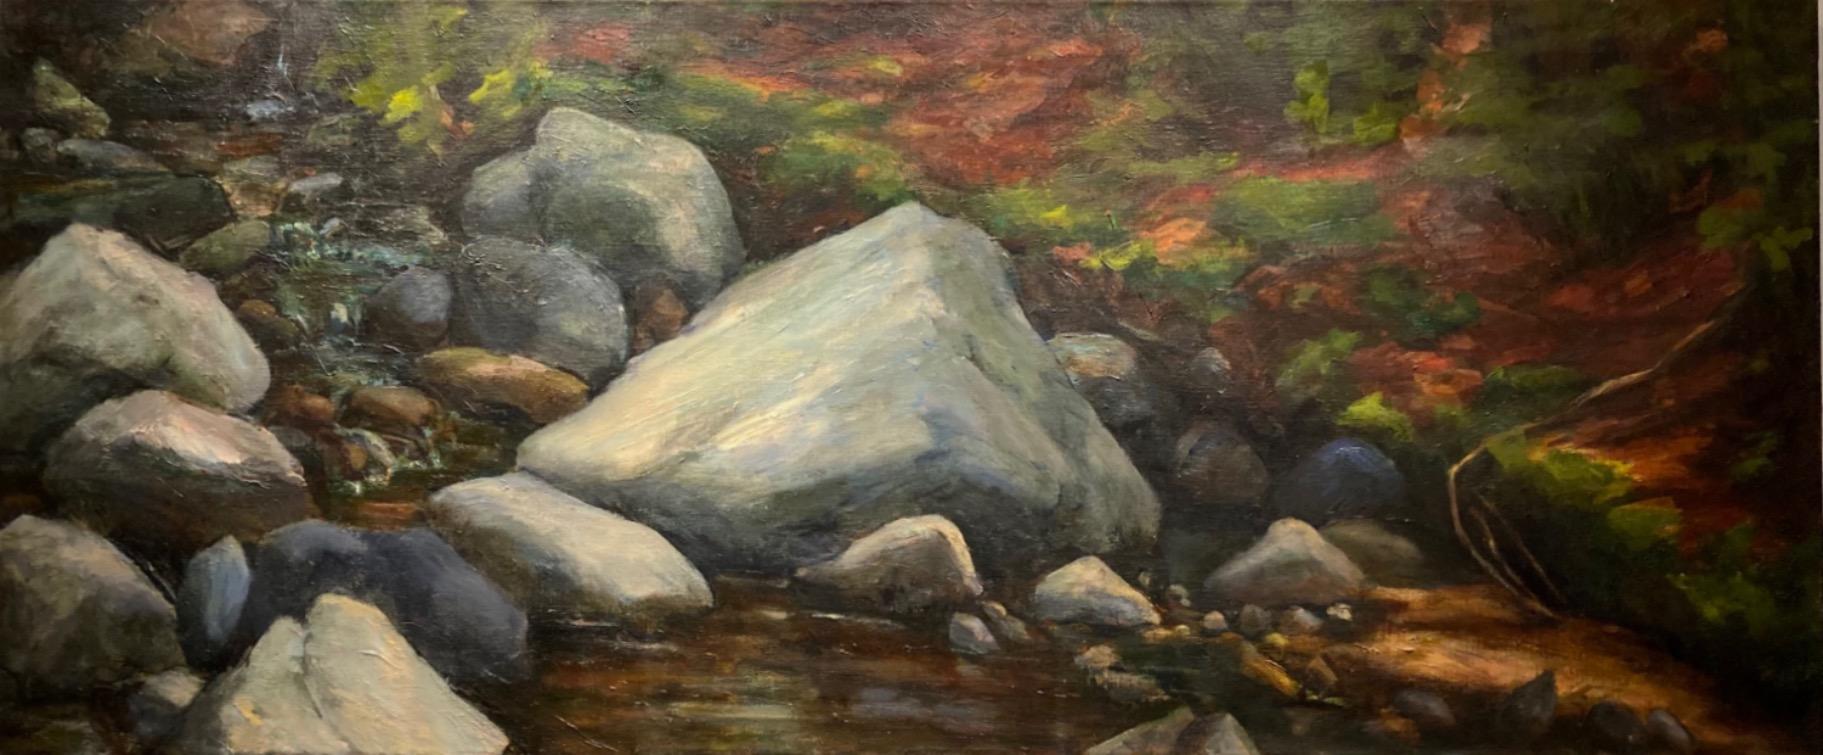 Cynthia Maurice  -  Rocks N Stream  -  oil on linen